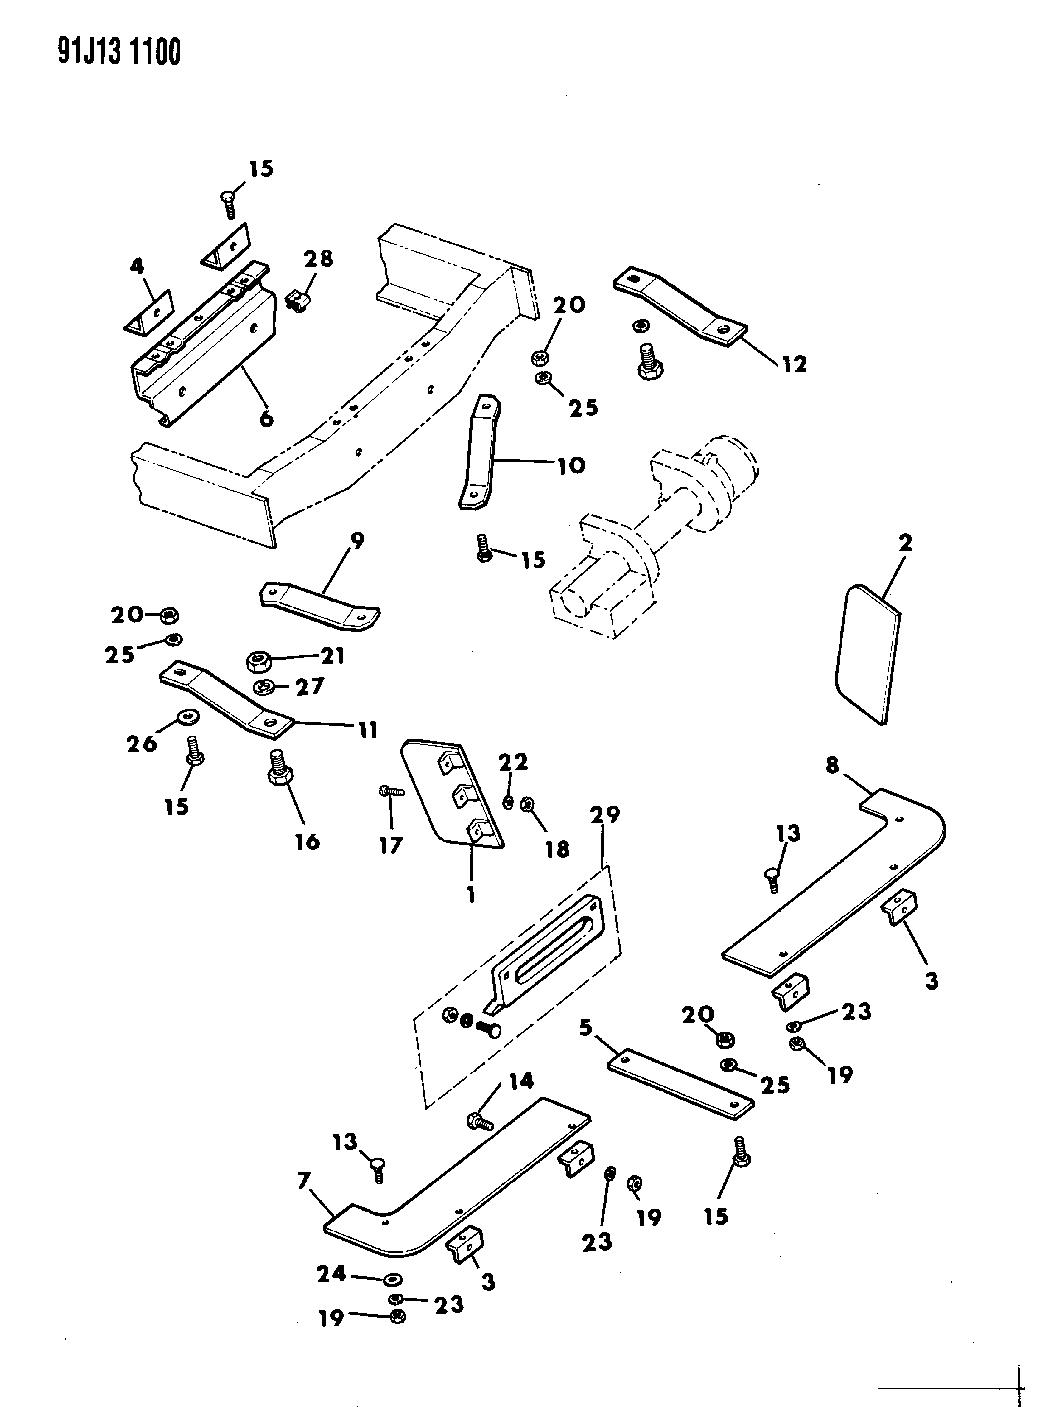 Giantz Winch Wiring Diagram